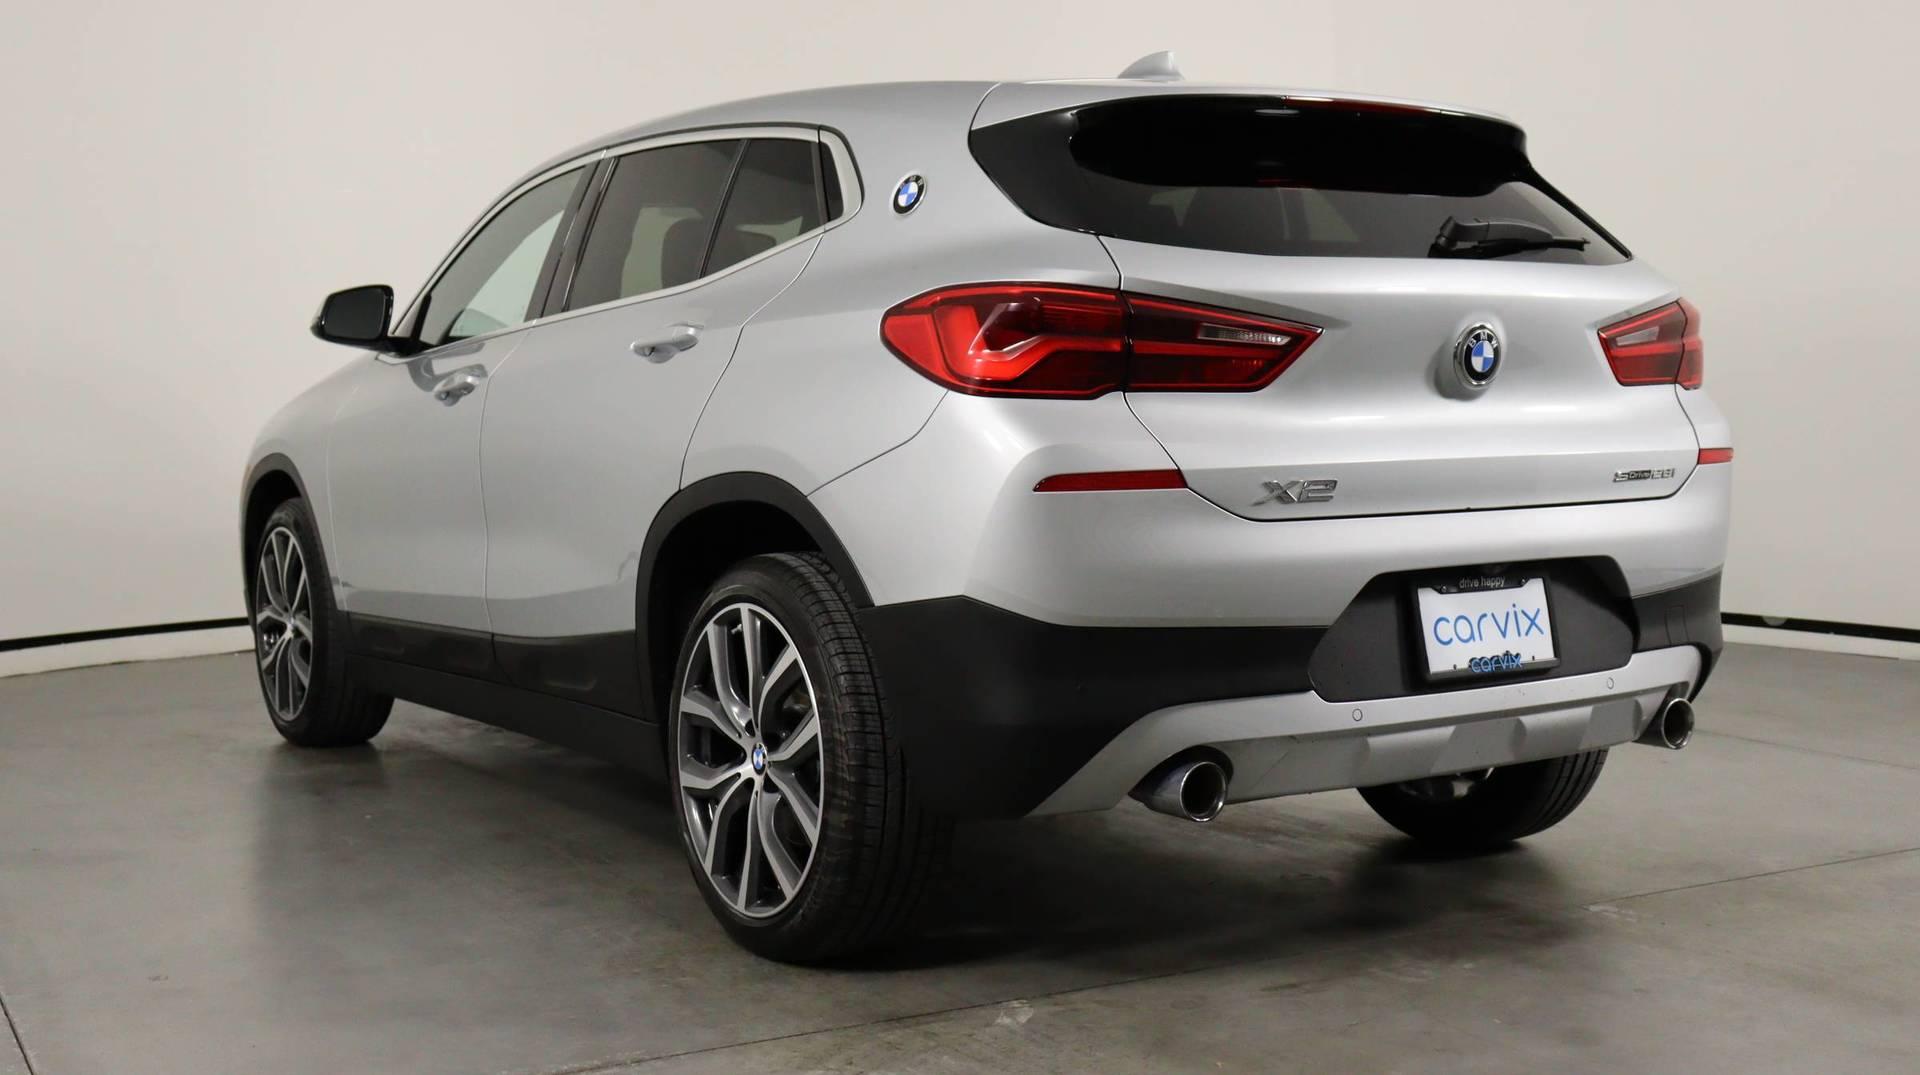 Carvix - Used vehicle - SUV BMW X2 2018